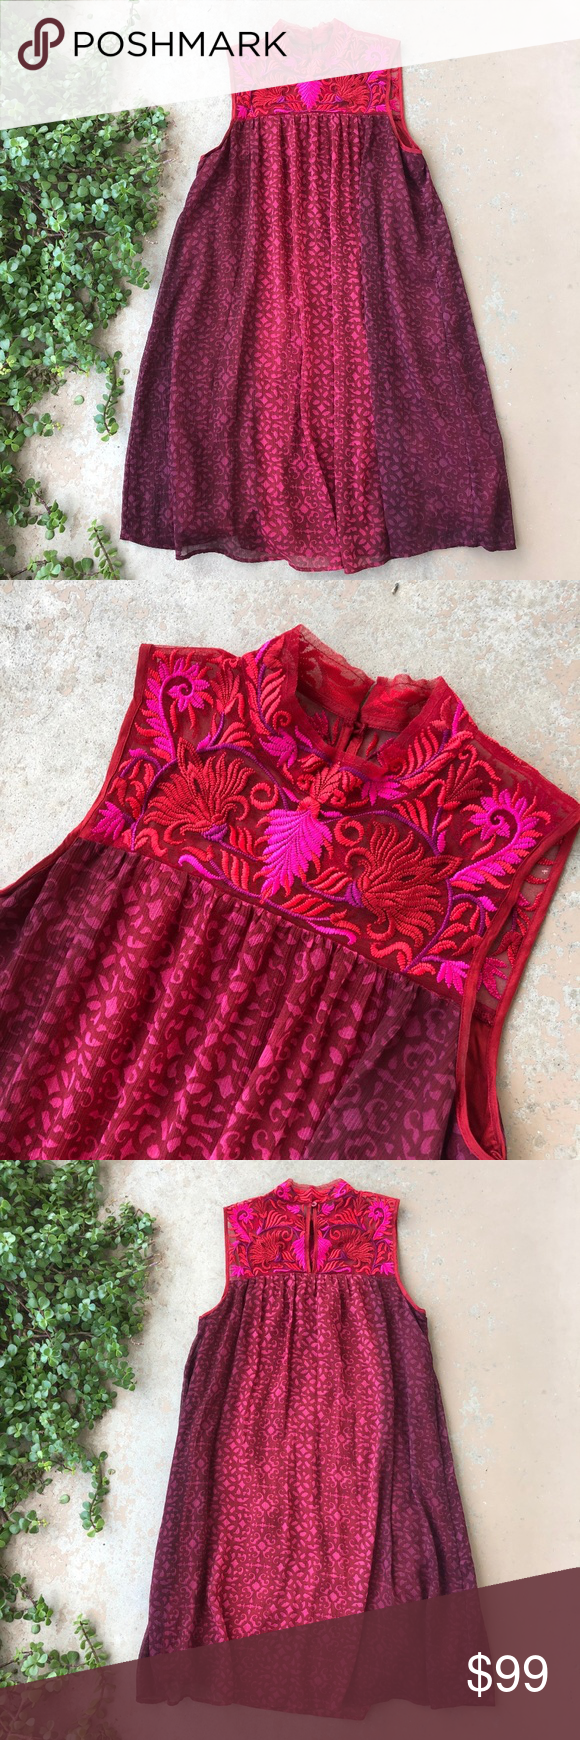 cffad6ecac939 Niki Mahajan Anthropologie Amara Swing Dress Features: Embroidered floral  neckline, ombre red pattern,